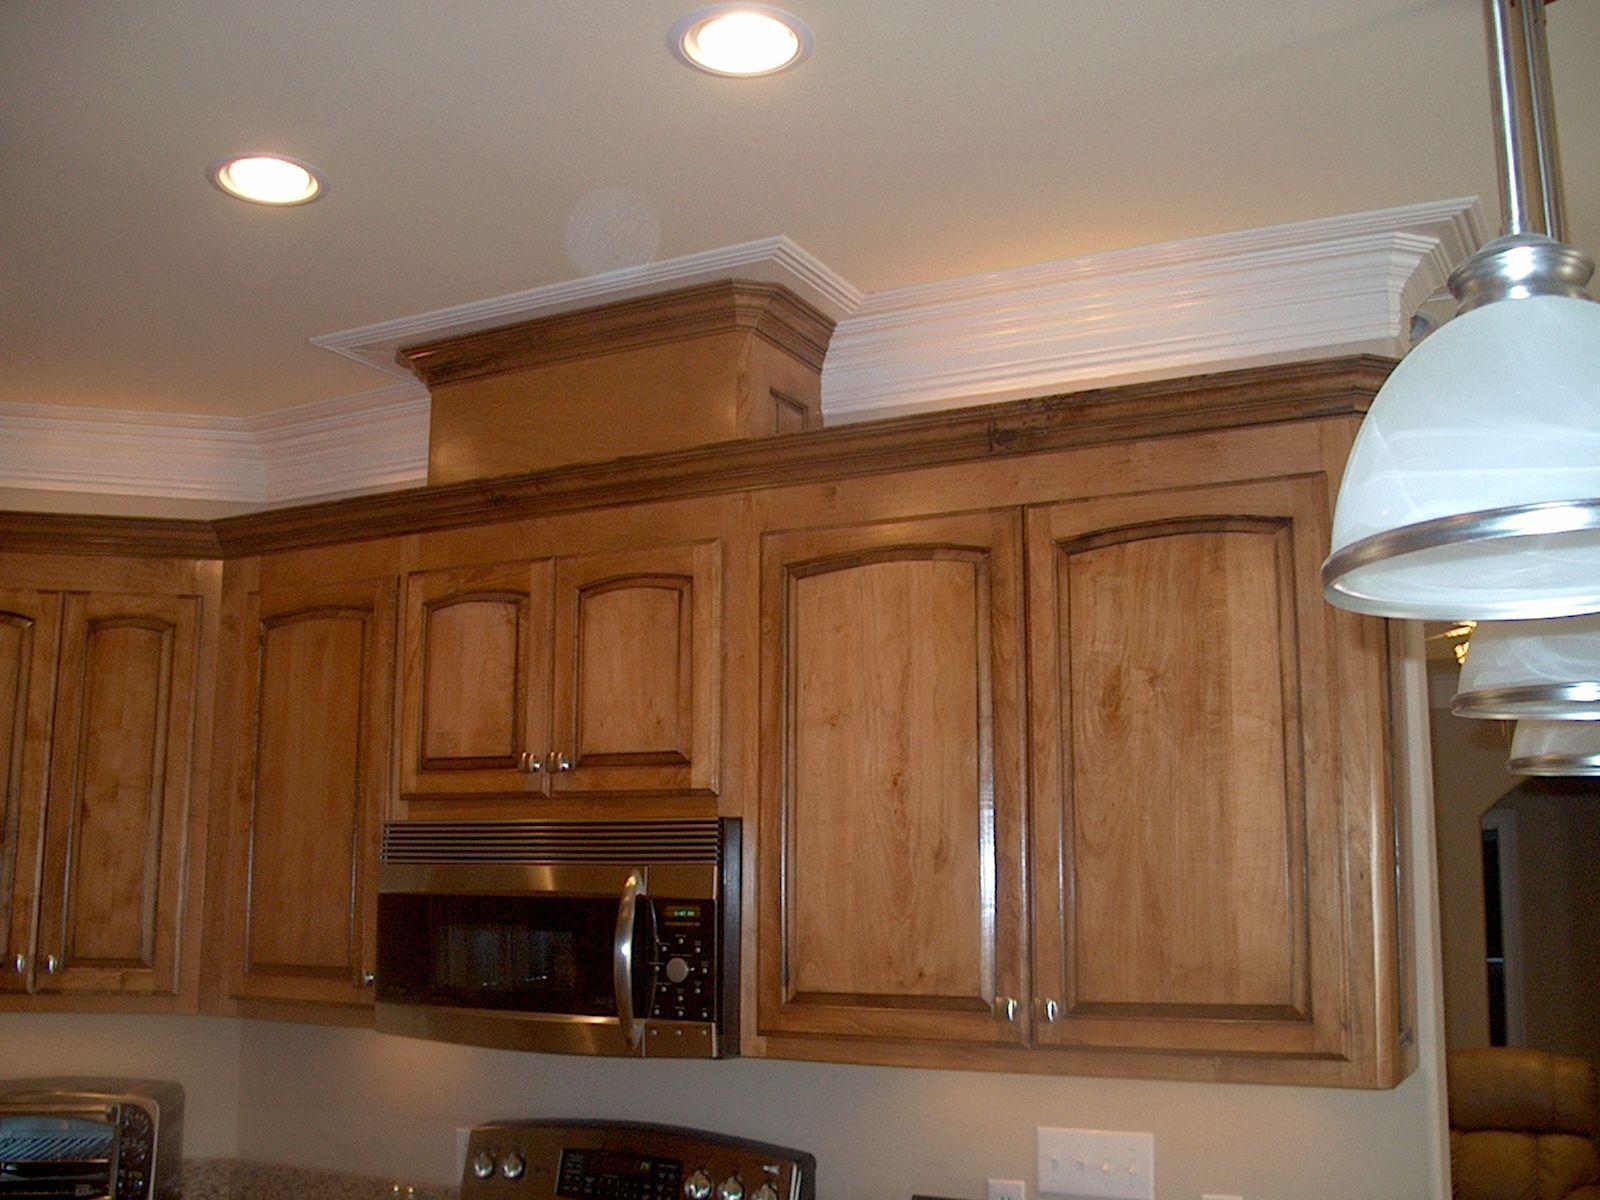 kitchen cabinets cover kitchen vent